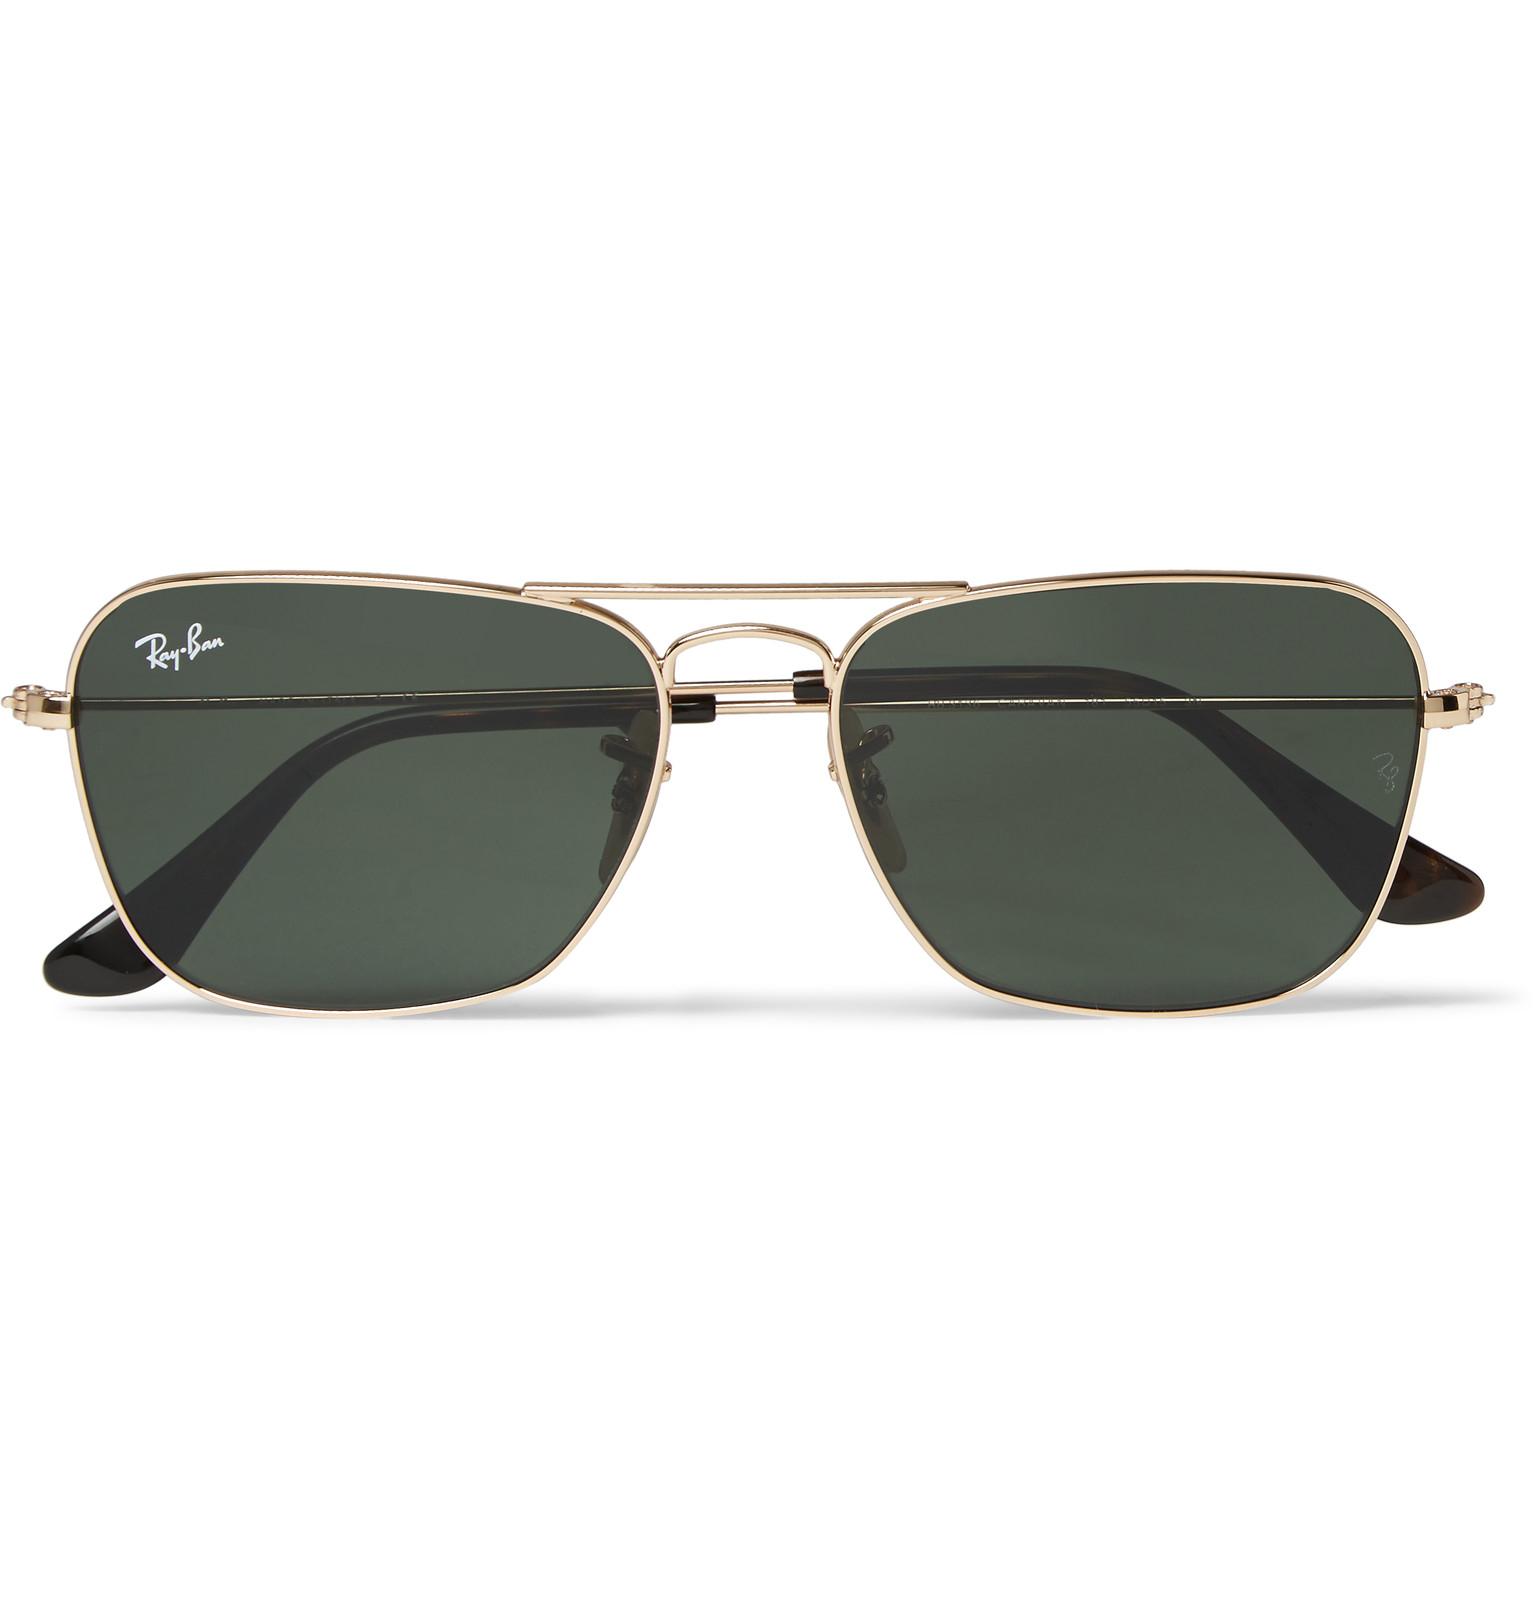 Ray Ban Mens Sunglasses Rb3544 Metal David Simchi Levi